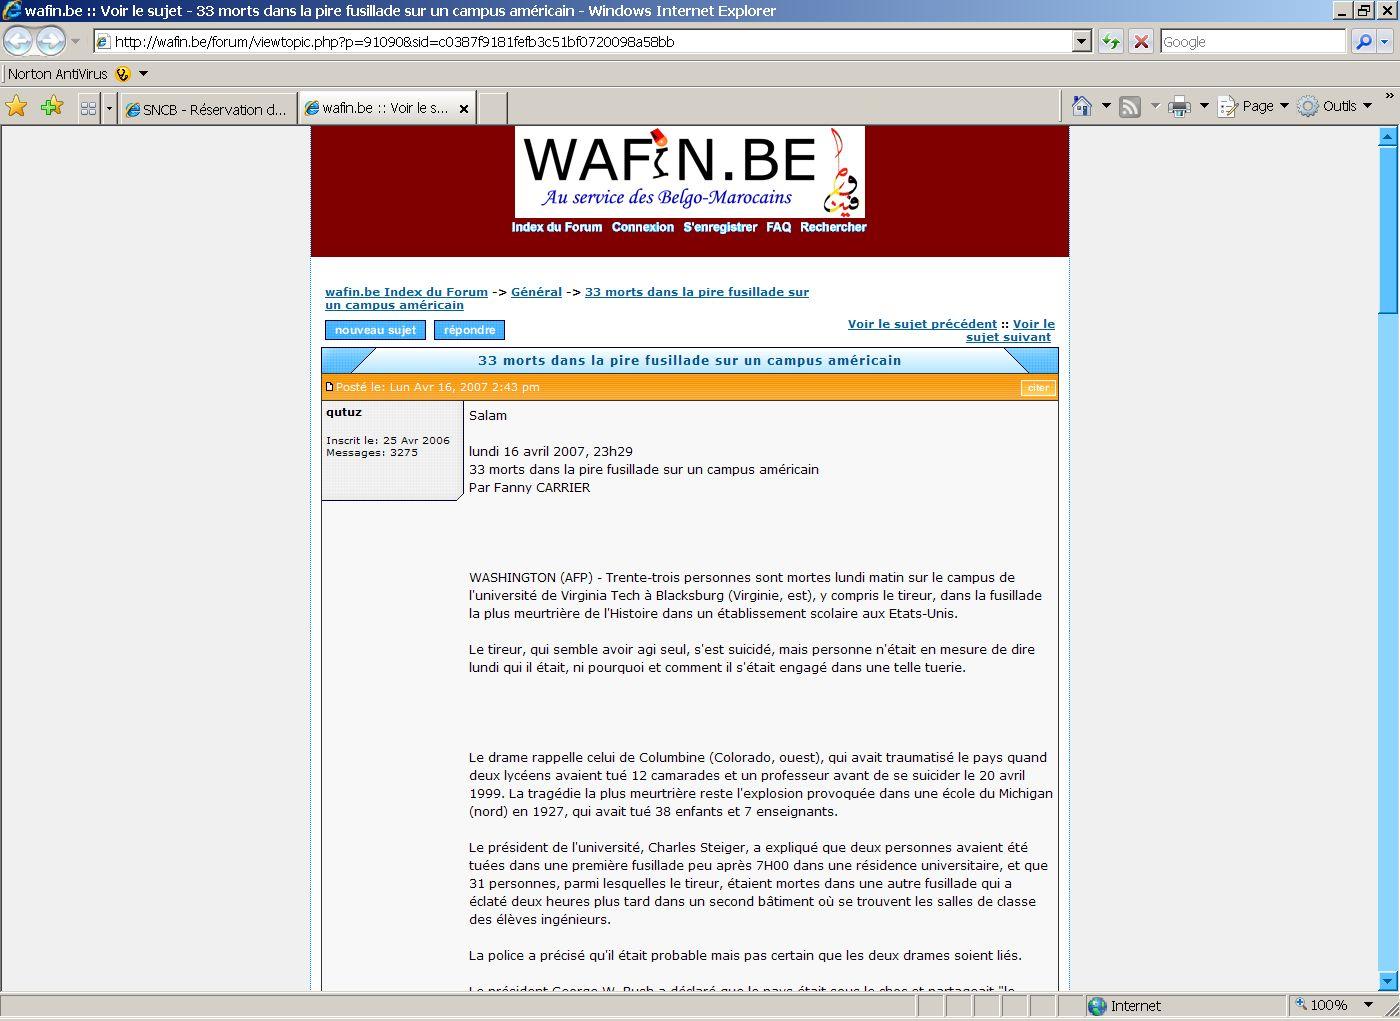 Propos antisémites tenus sur un forum internet